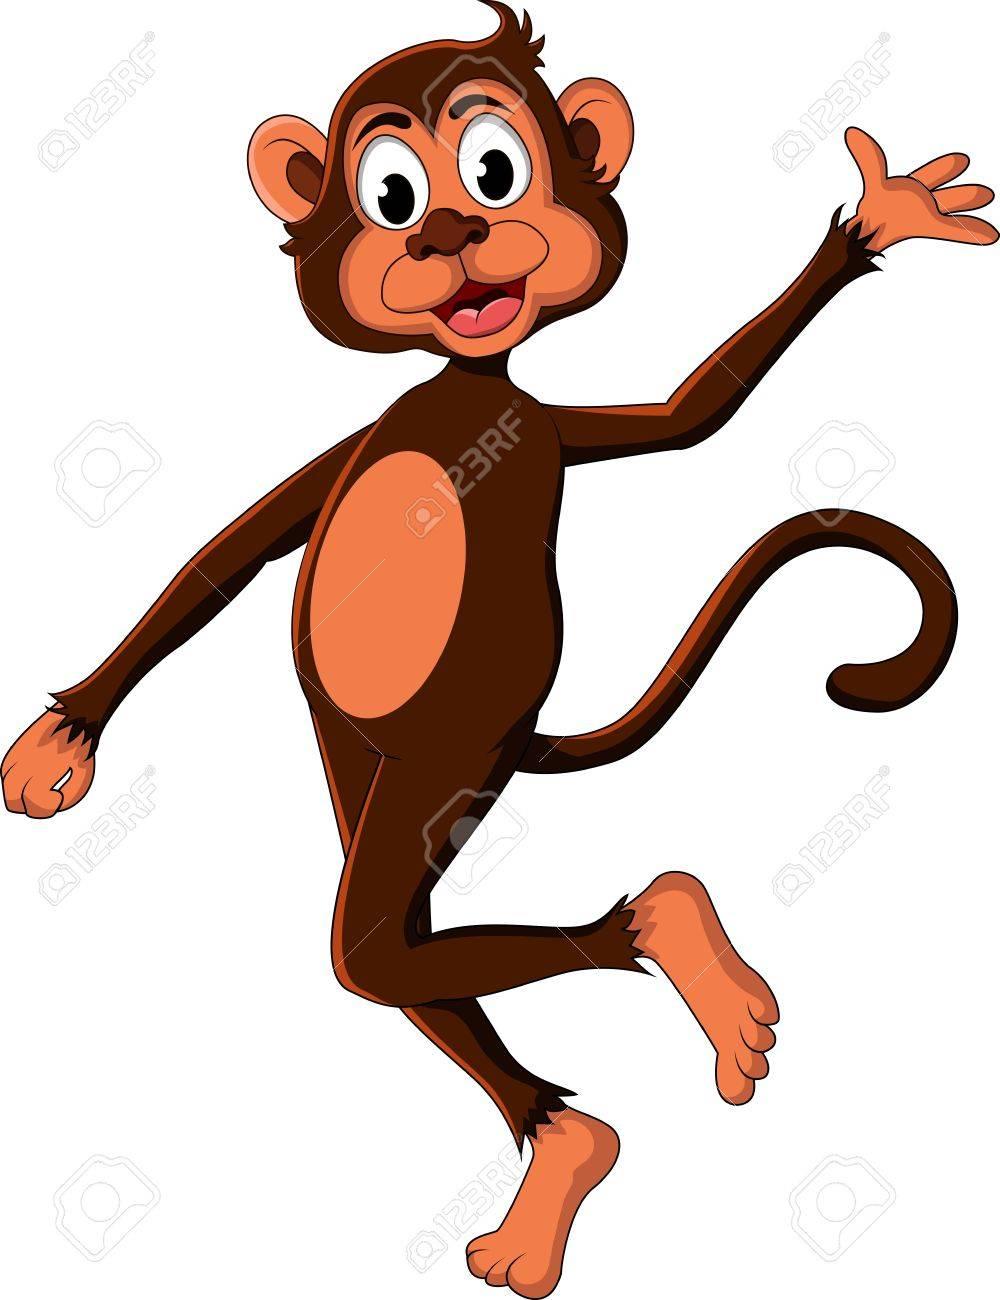 cute monkey cartoon expression Stock Vector - 17840634